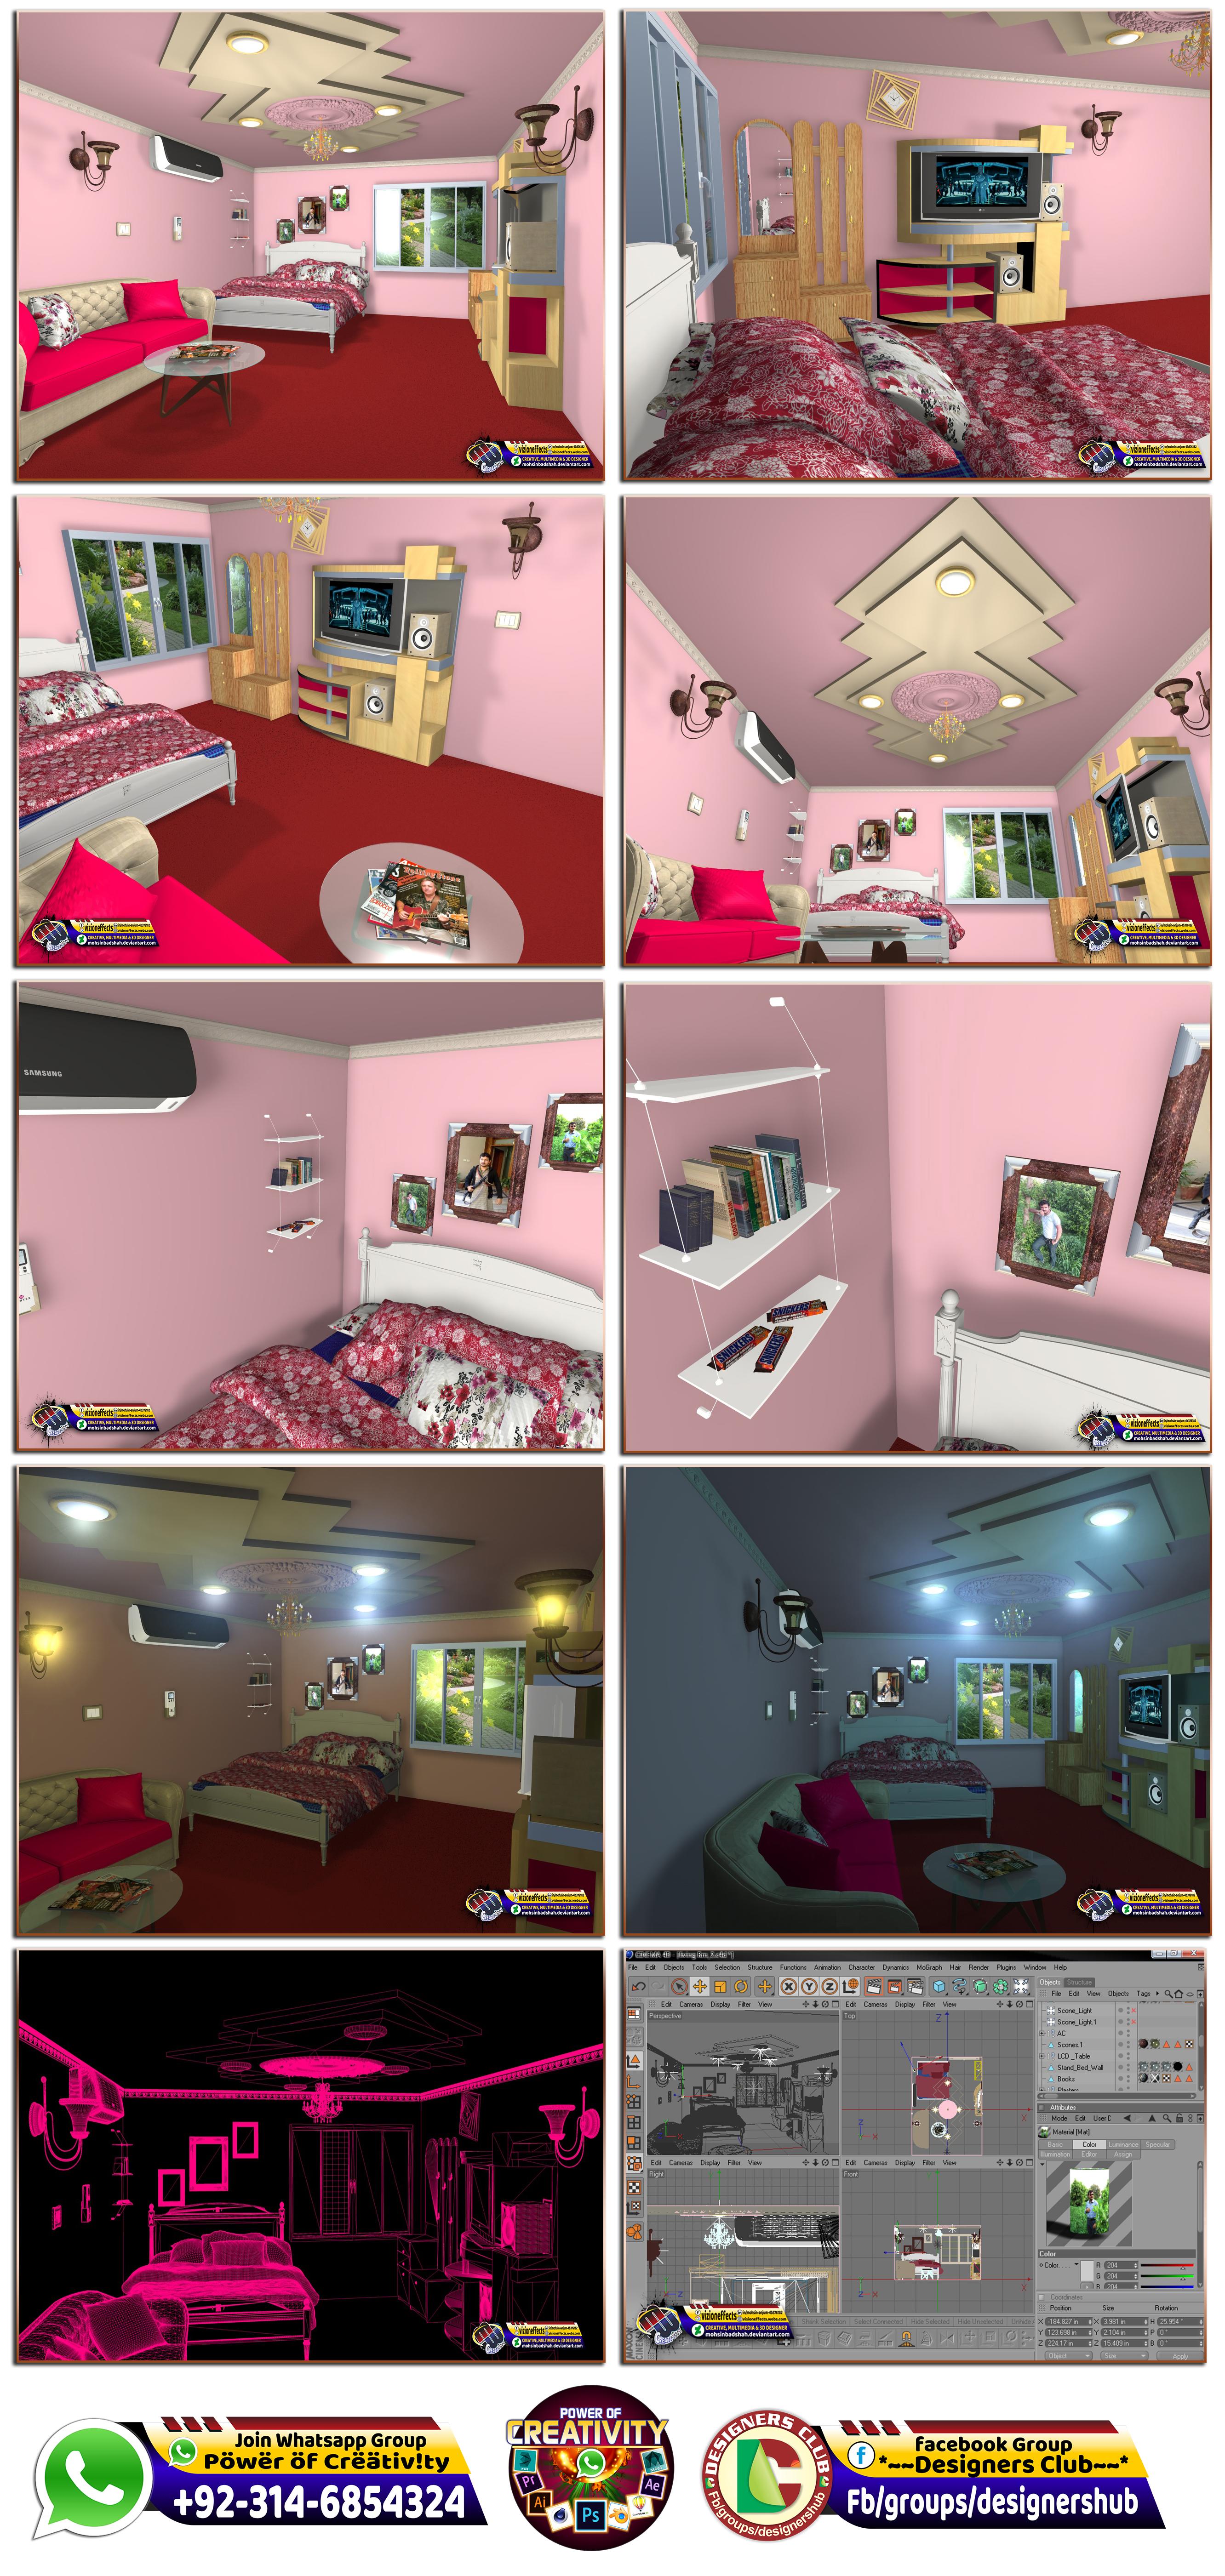 Random Chat Room Pakistan